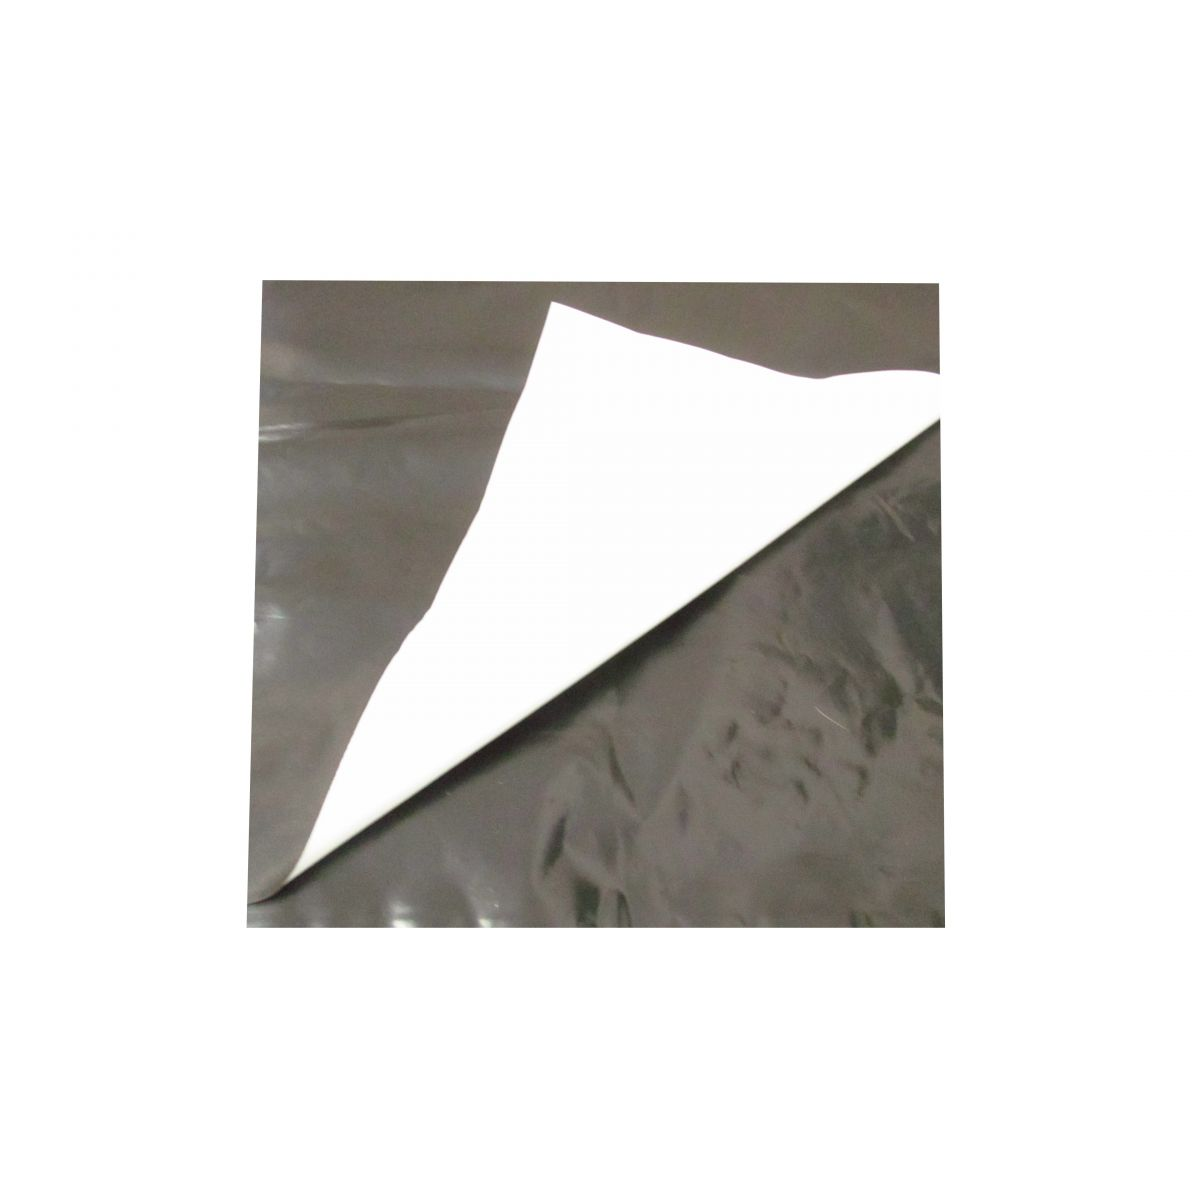 Lona Plastica Preta e Branca 10m x 6m 150 Micras  - Casafaz